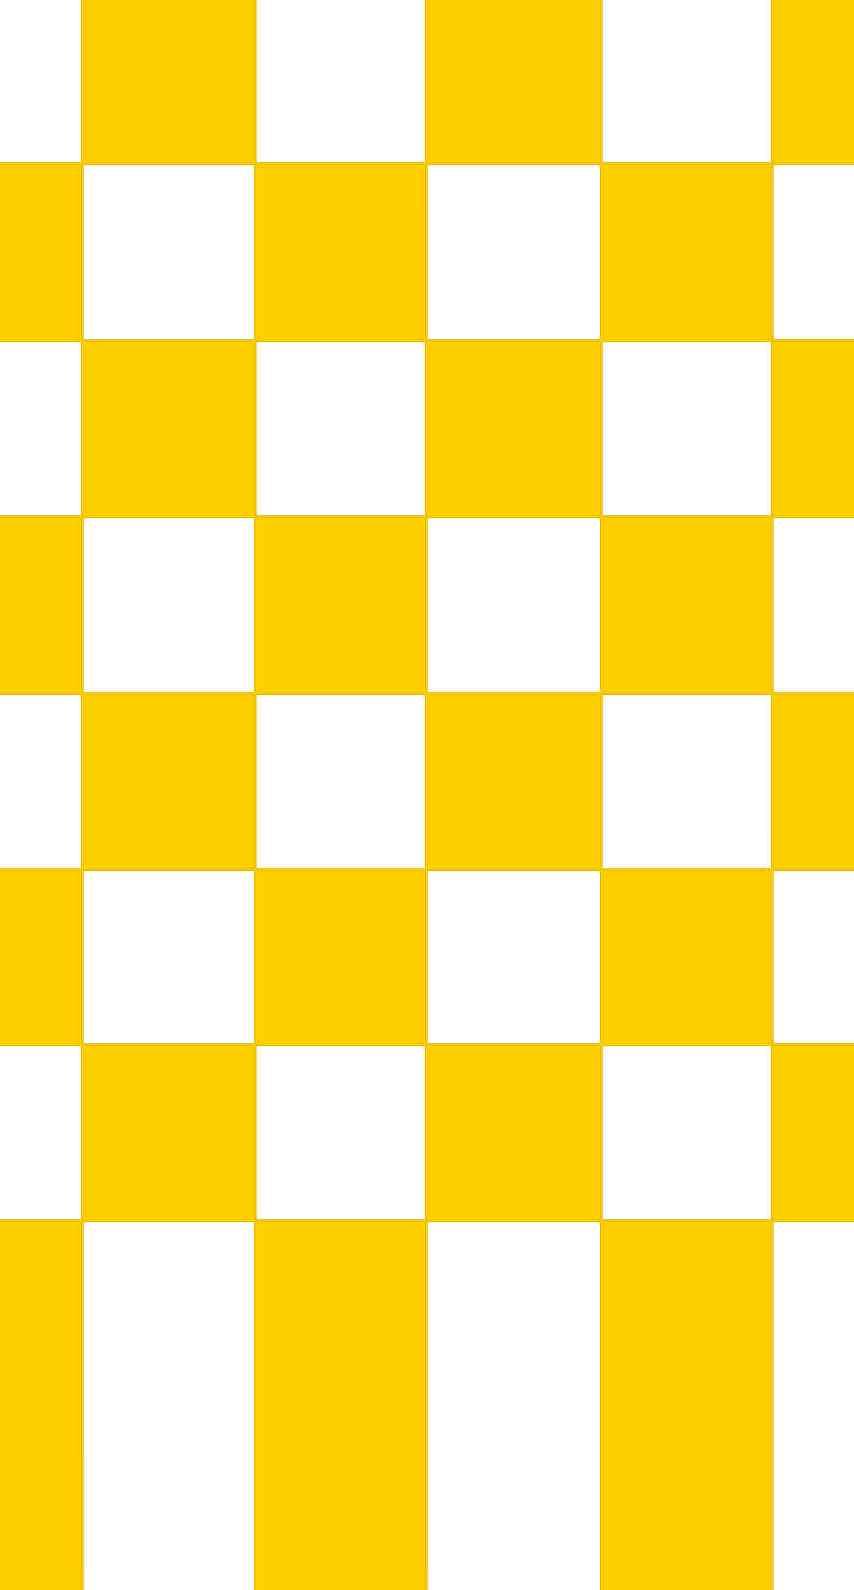 Ki shelf checkered | wallpaper.sc iPhone8